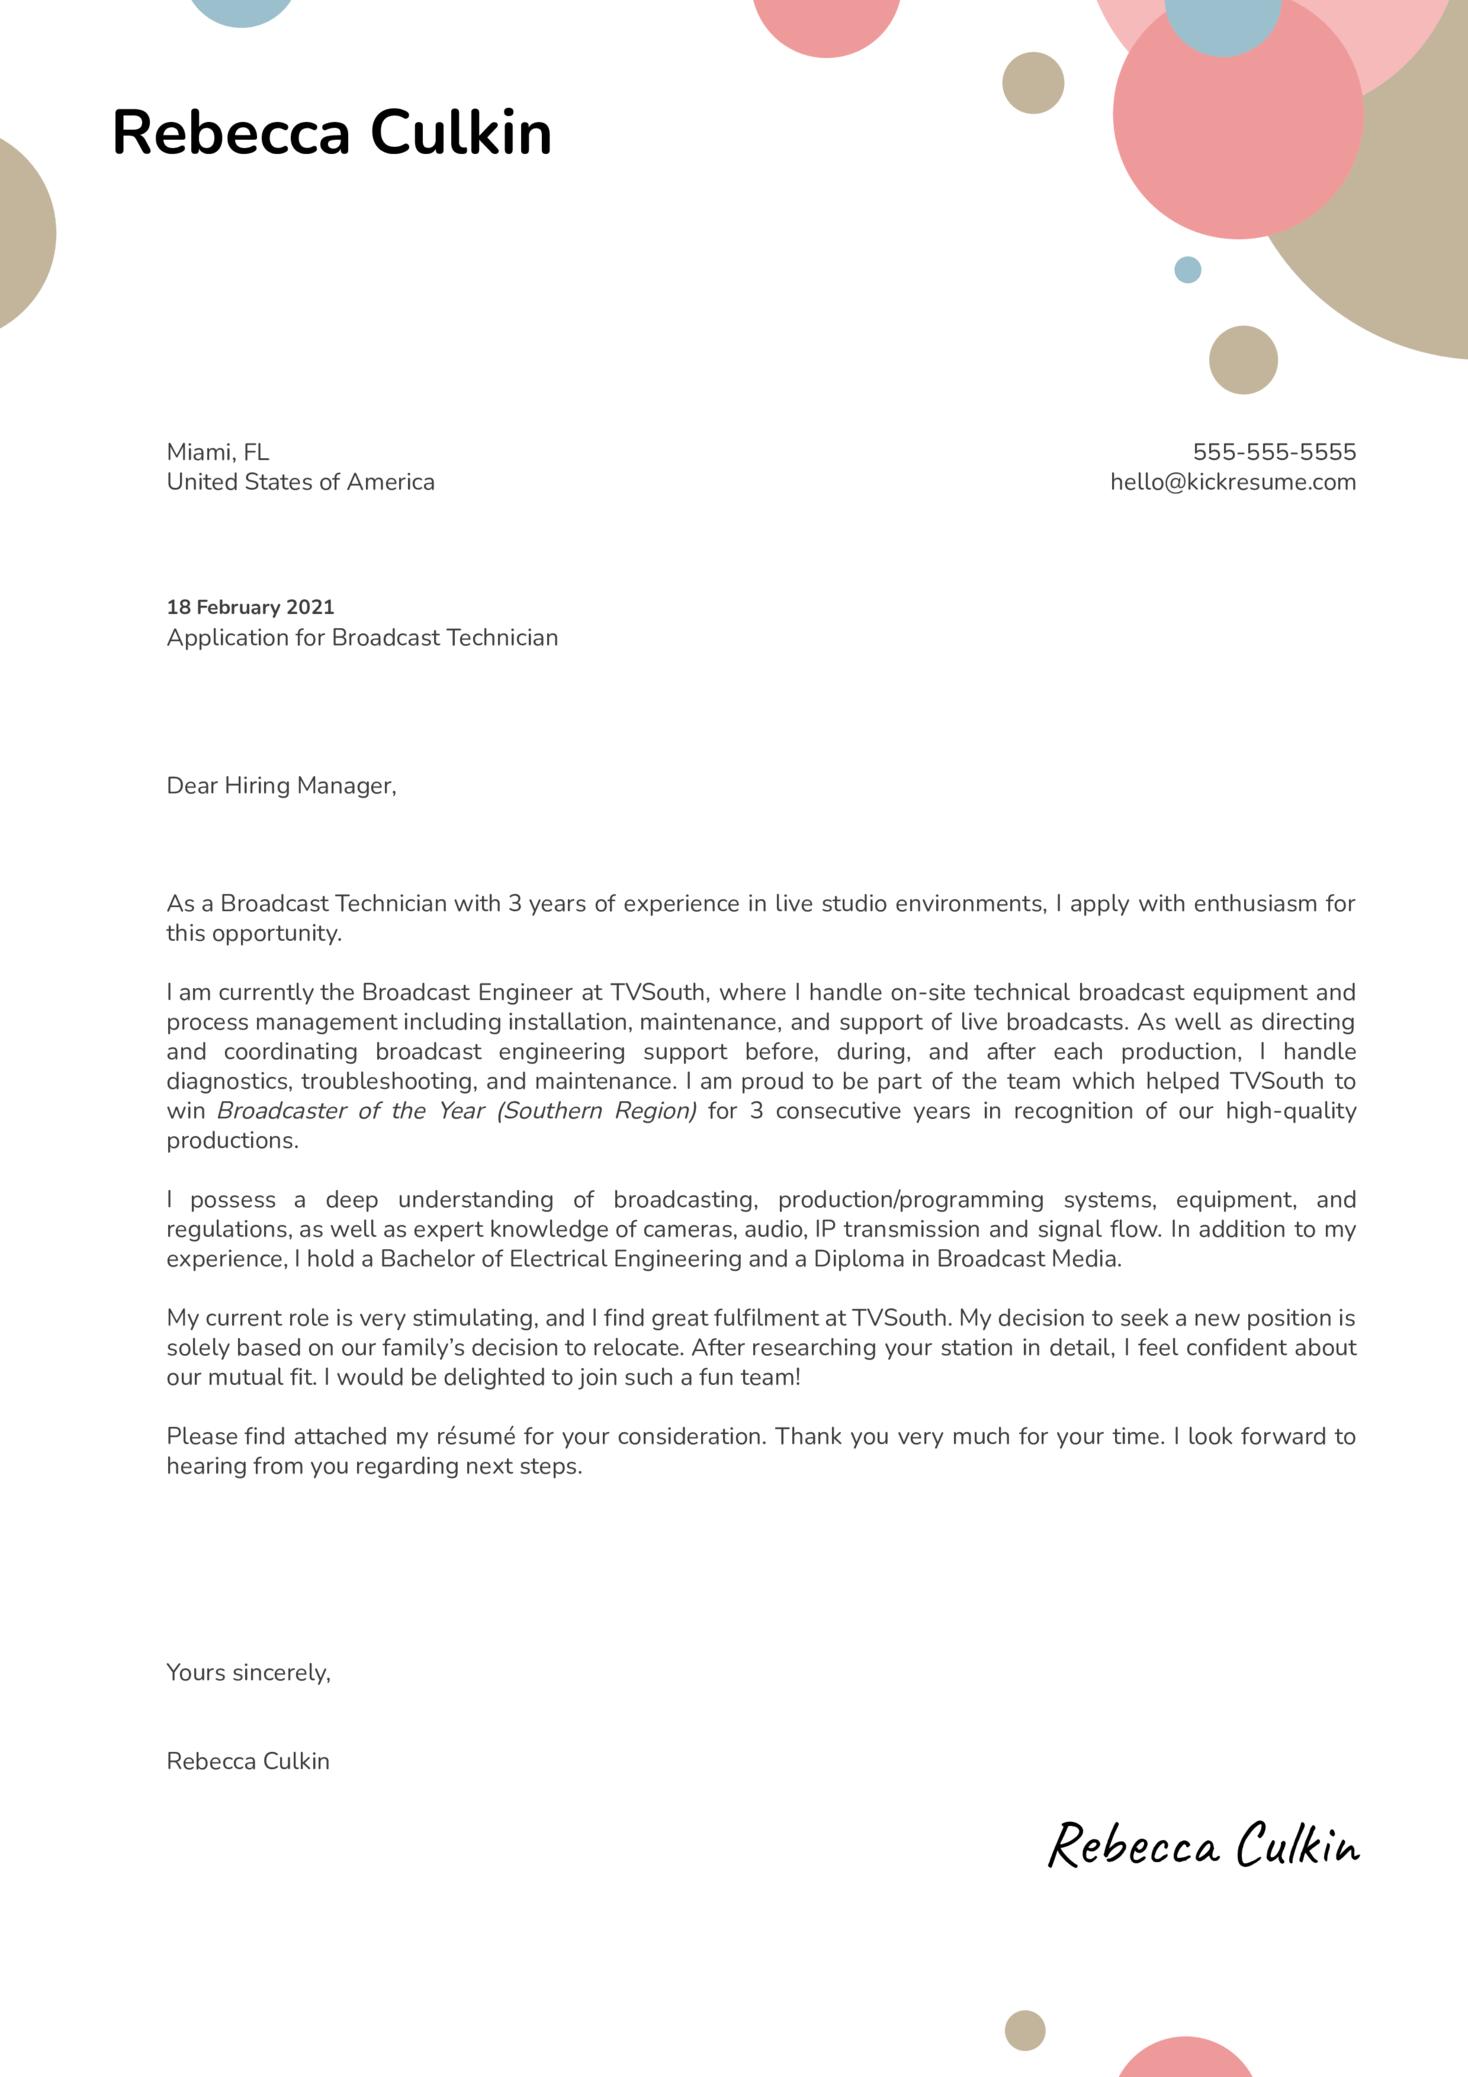 Broadcast Technician Cover Letter Sample